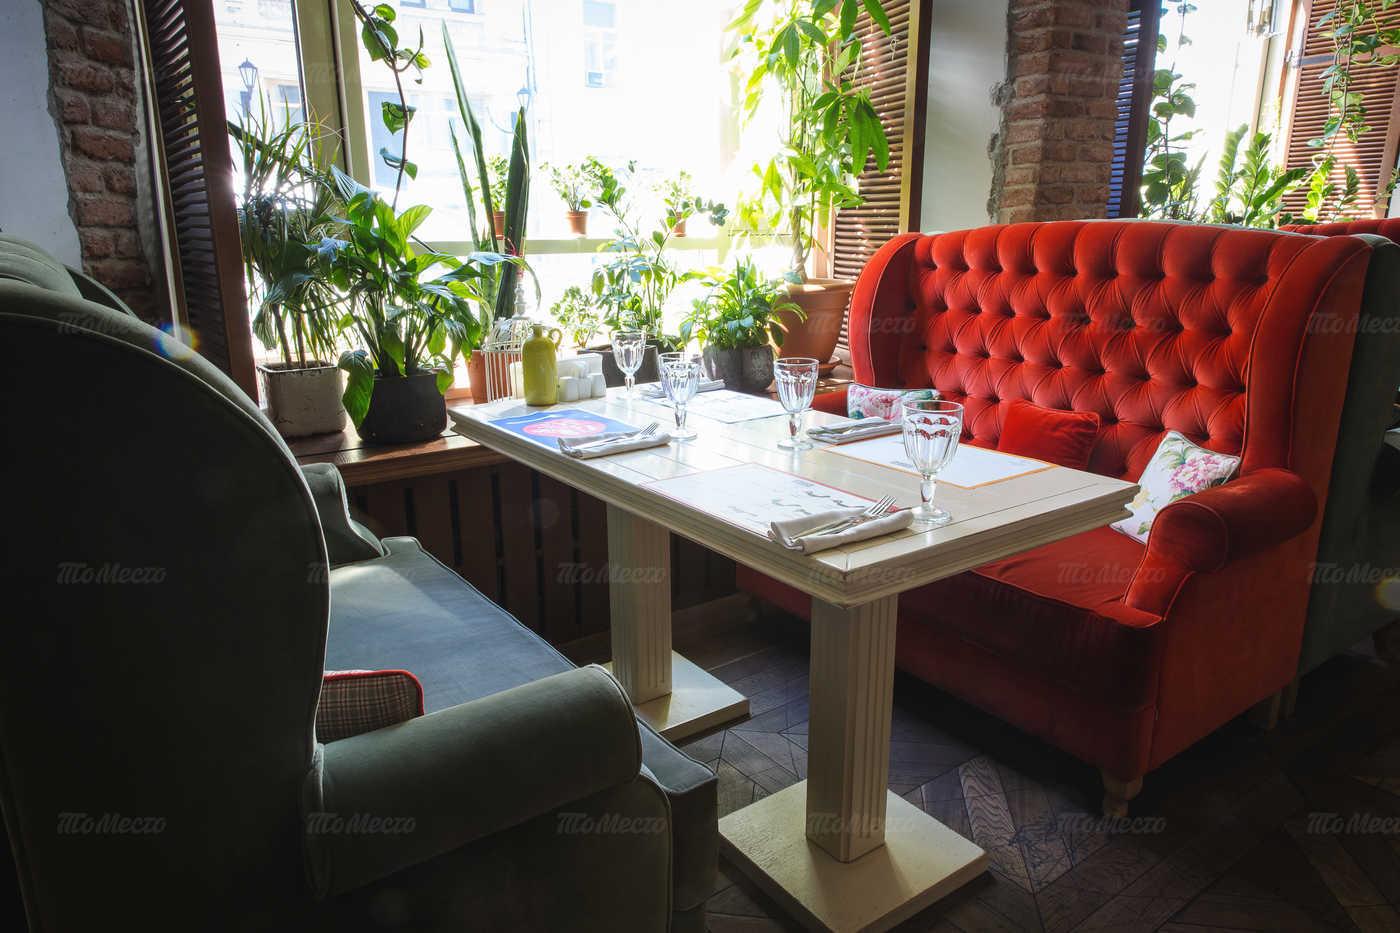 Меню ресторана Пряности & Радости на Пушечной улице